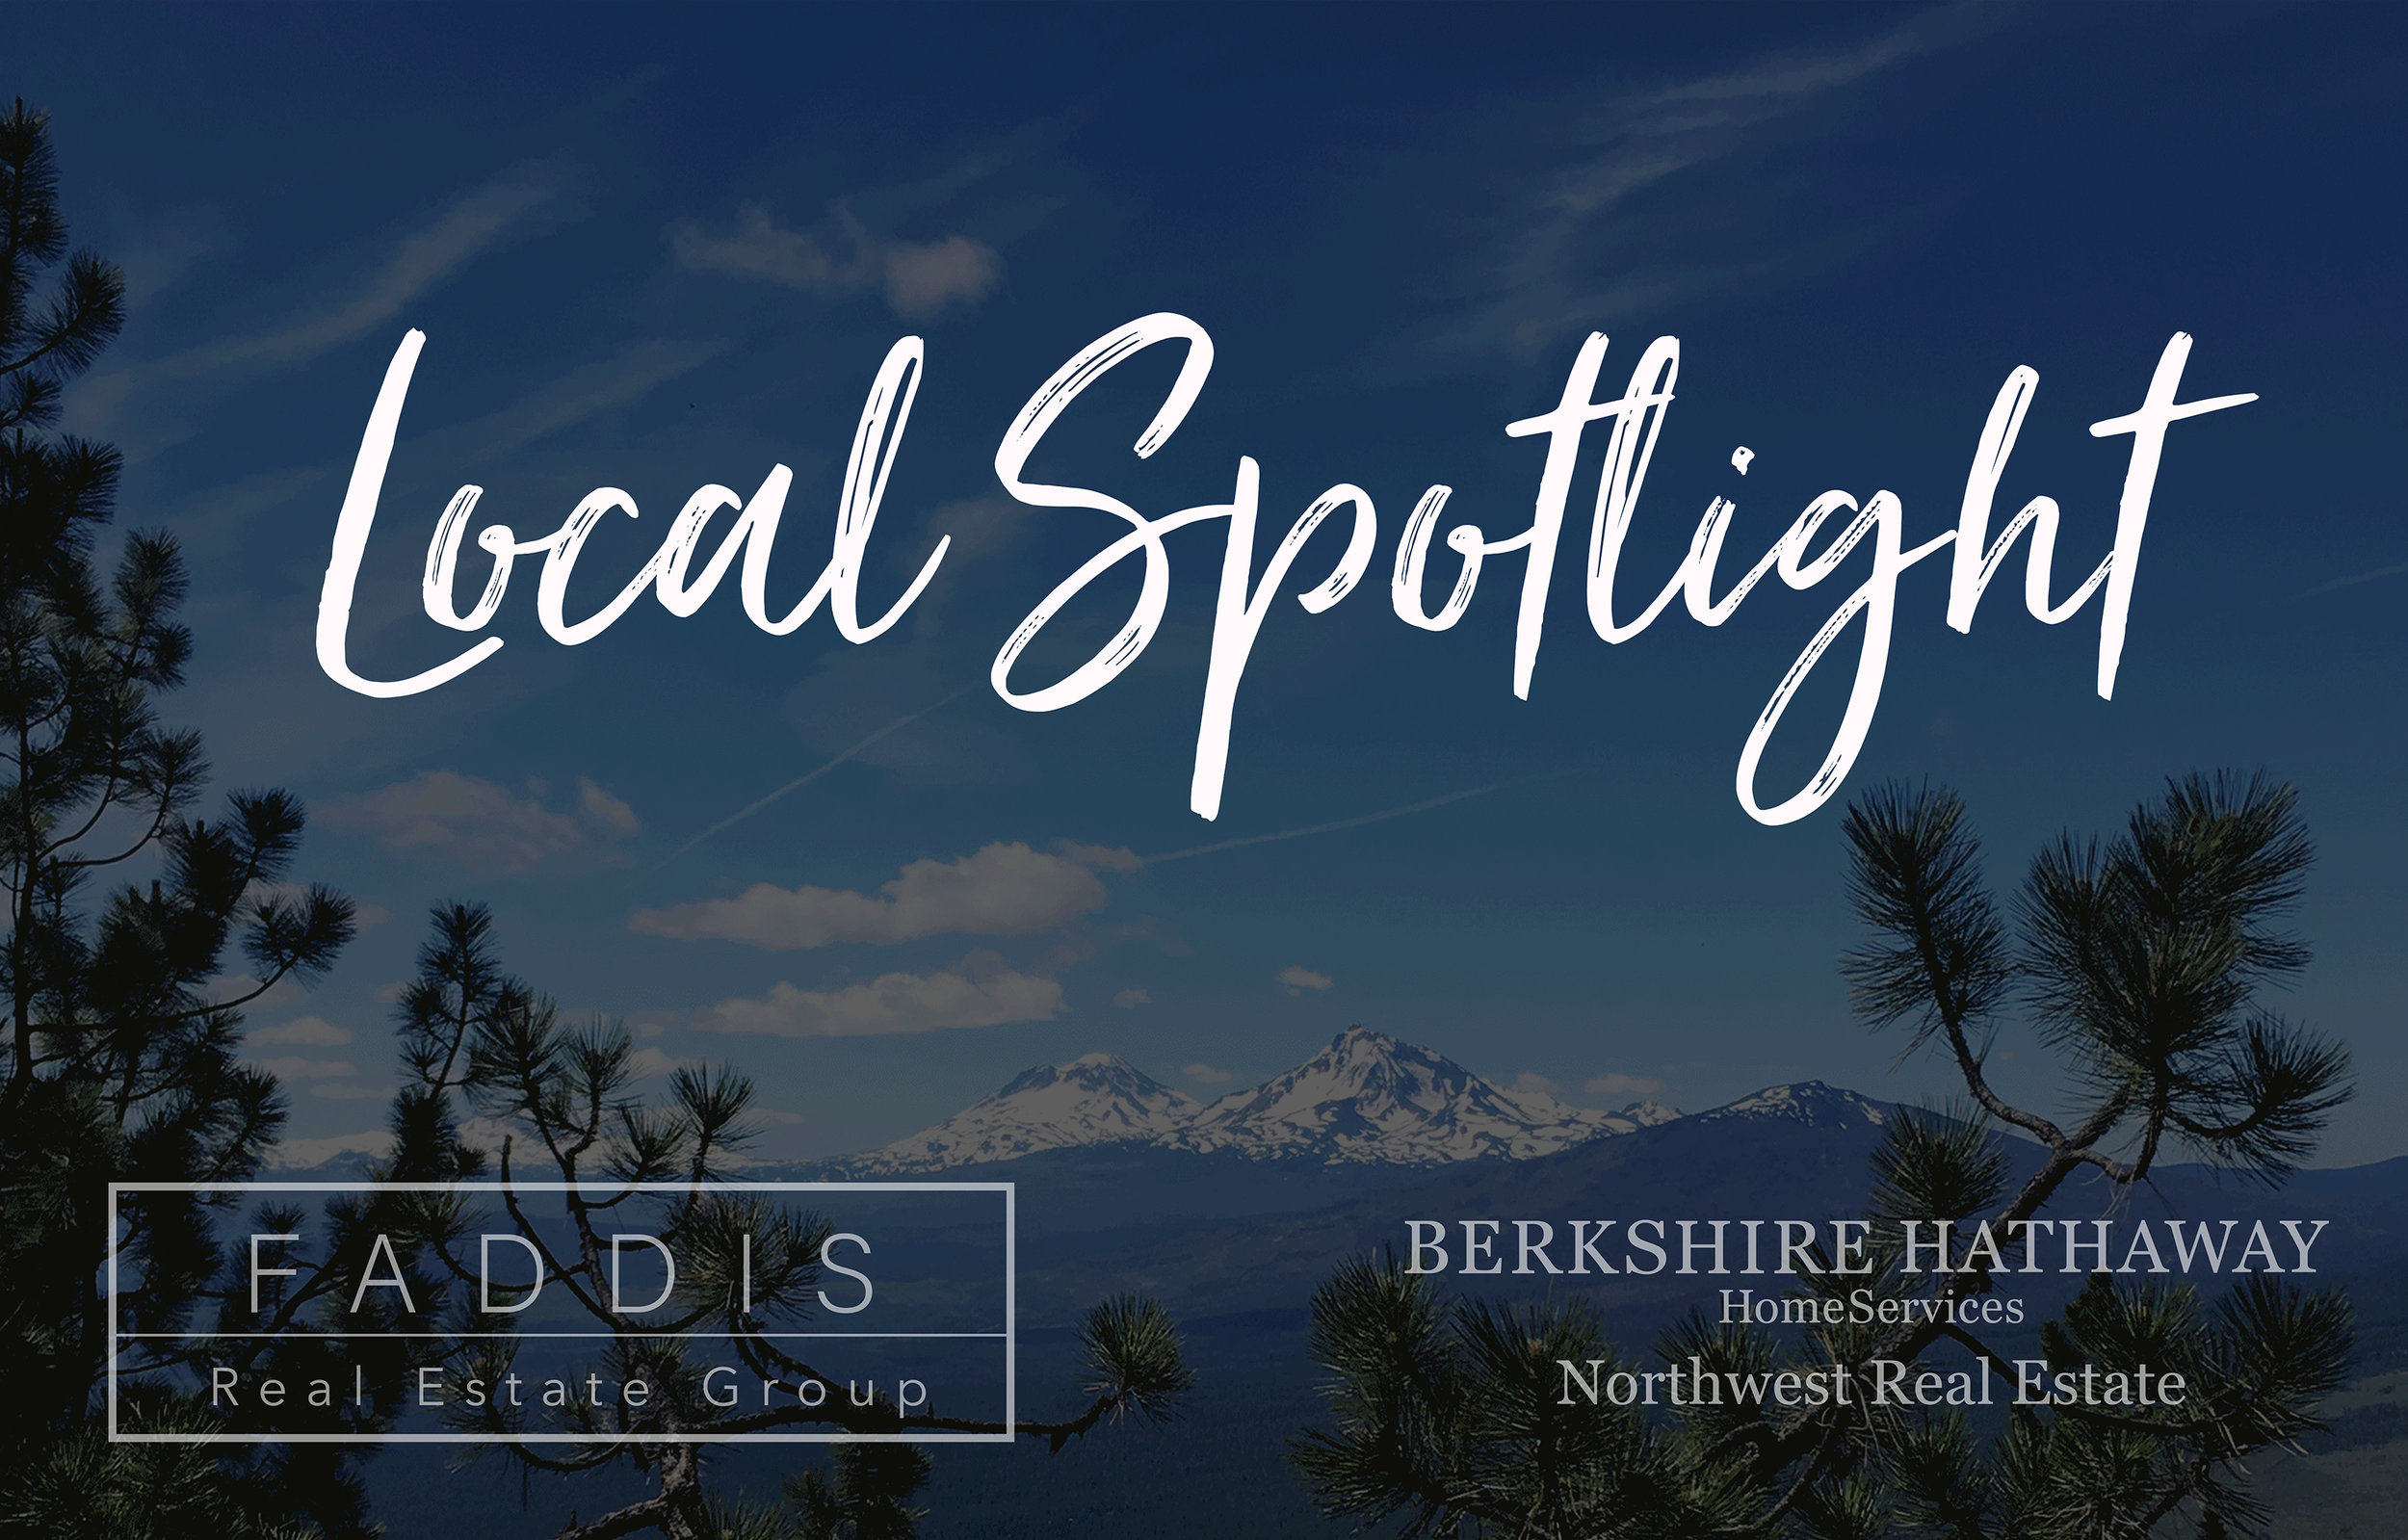 Local Spotlight, Faddis Real Estate Group, Bend Oregon